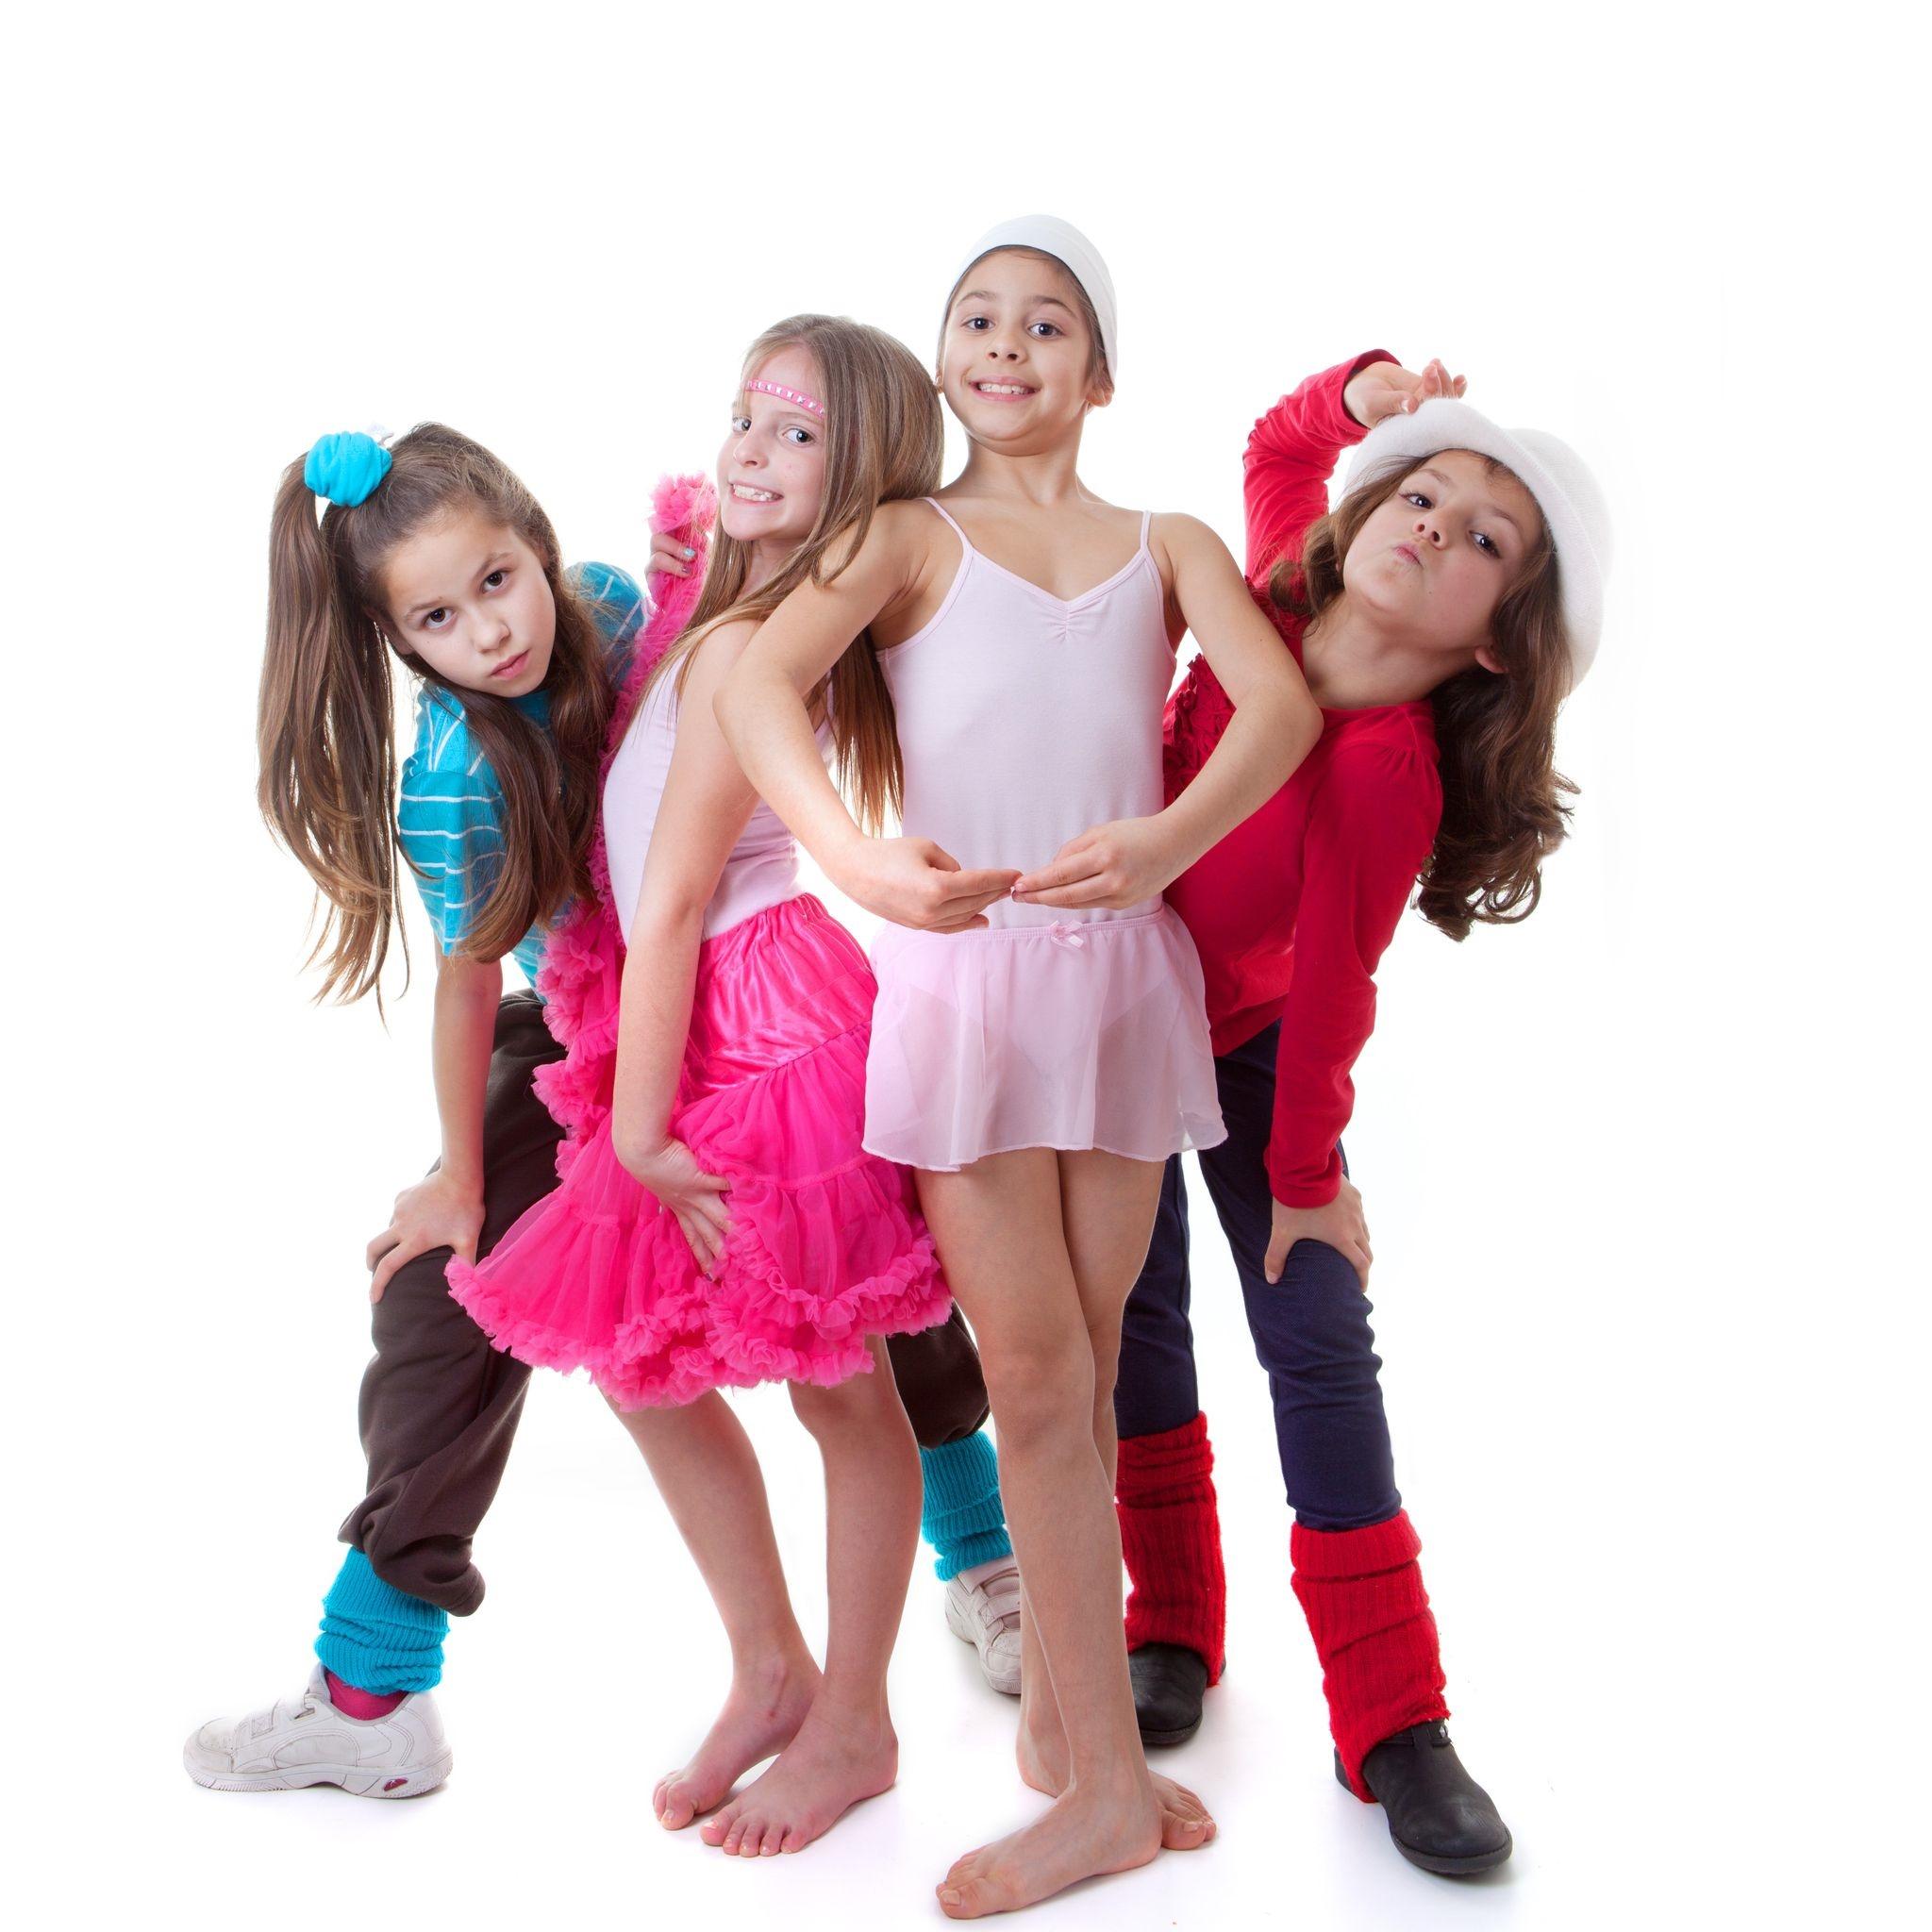 4 girl dancers